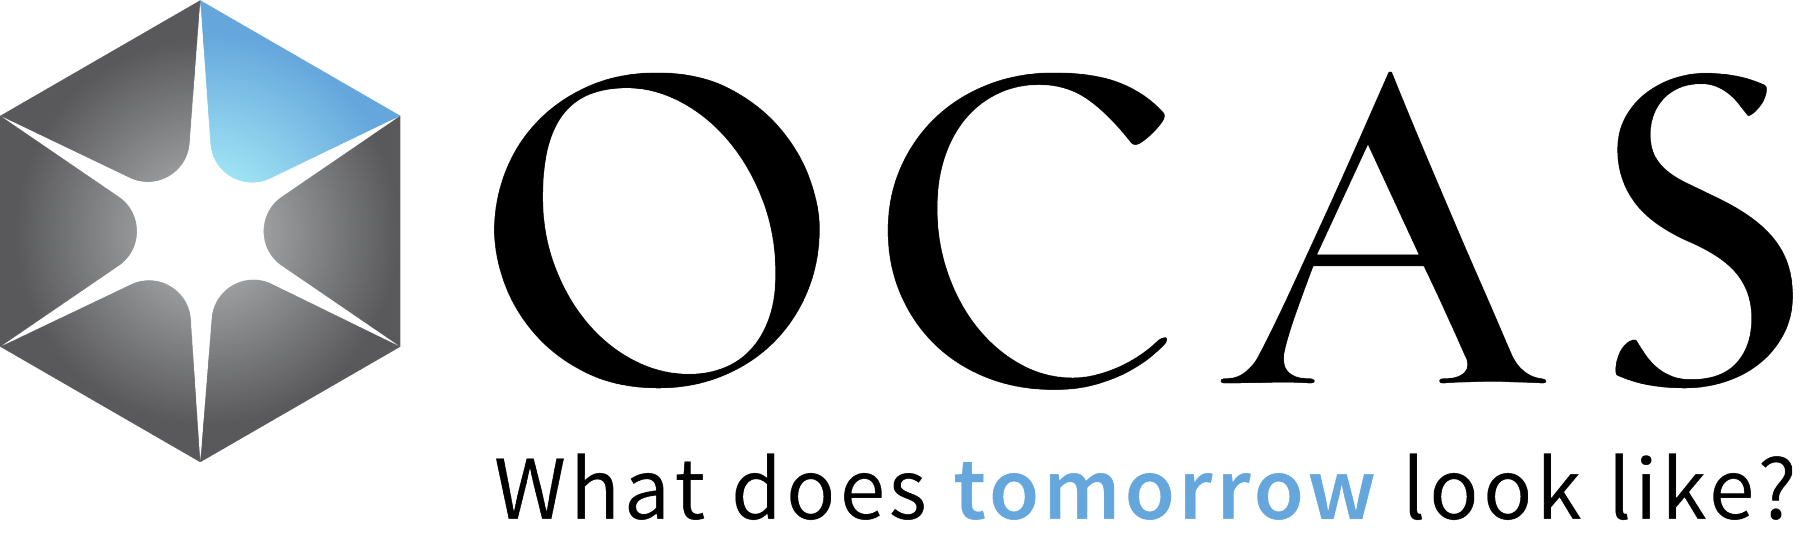 OCAS Logo with tagline: What does tomorrow look like